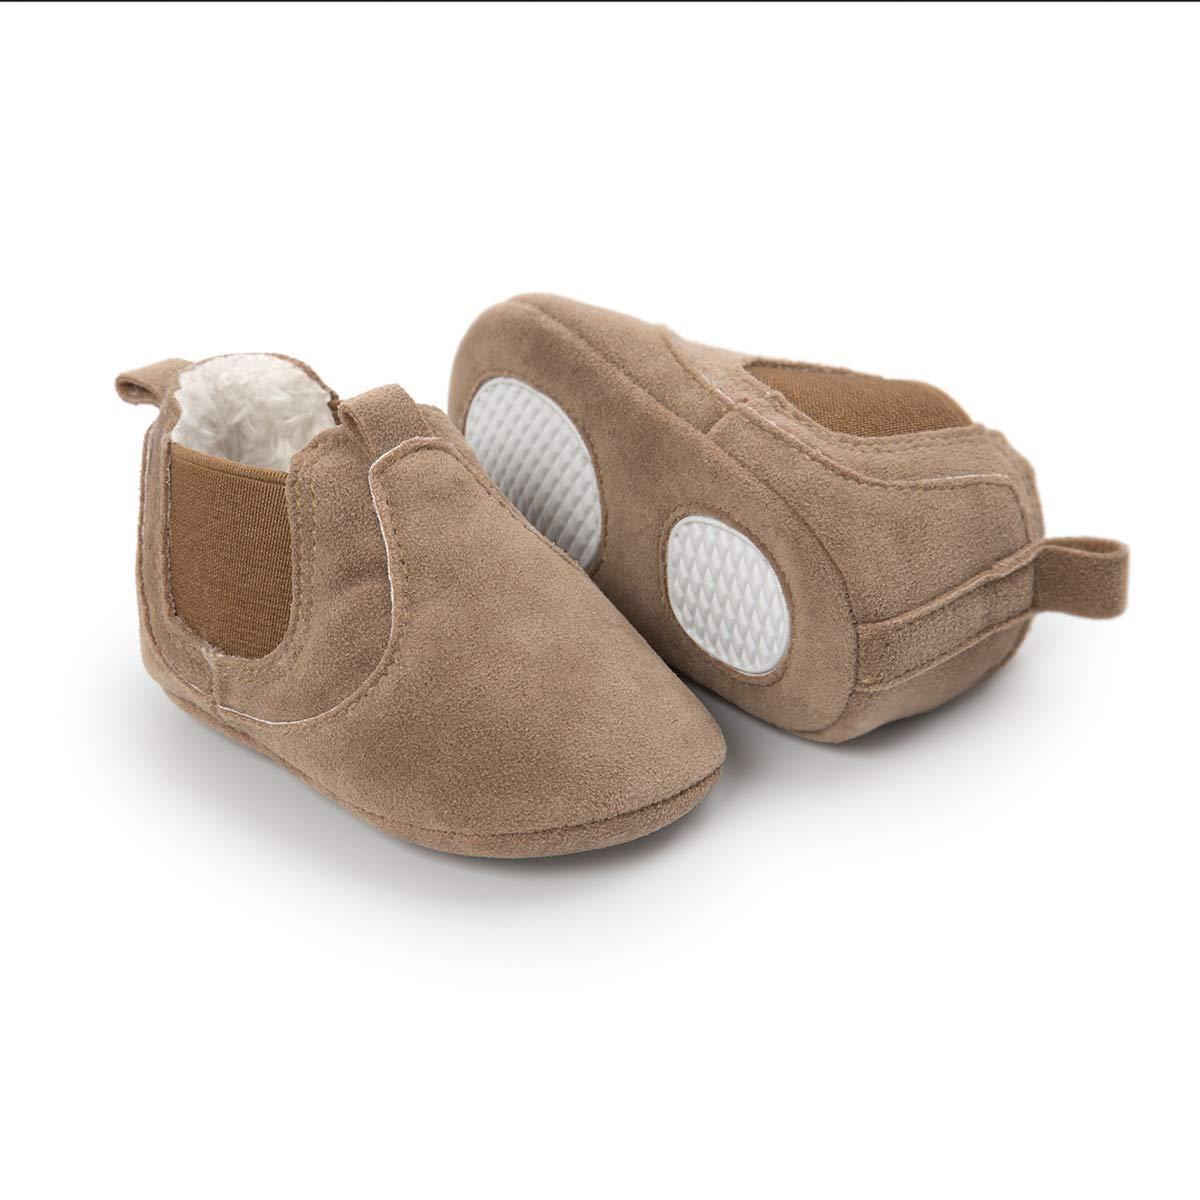 Morbuy Bebe Zapatos de Primeros Pasos Otoño e Invierno 0-18 Meses ...